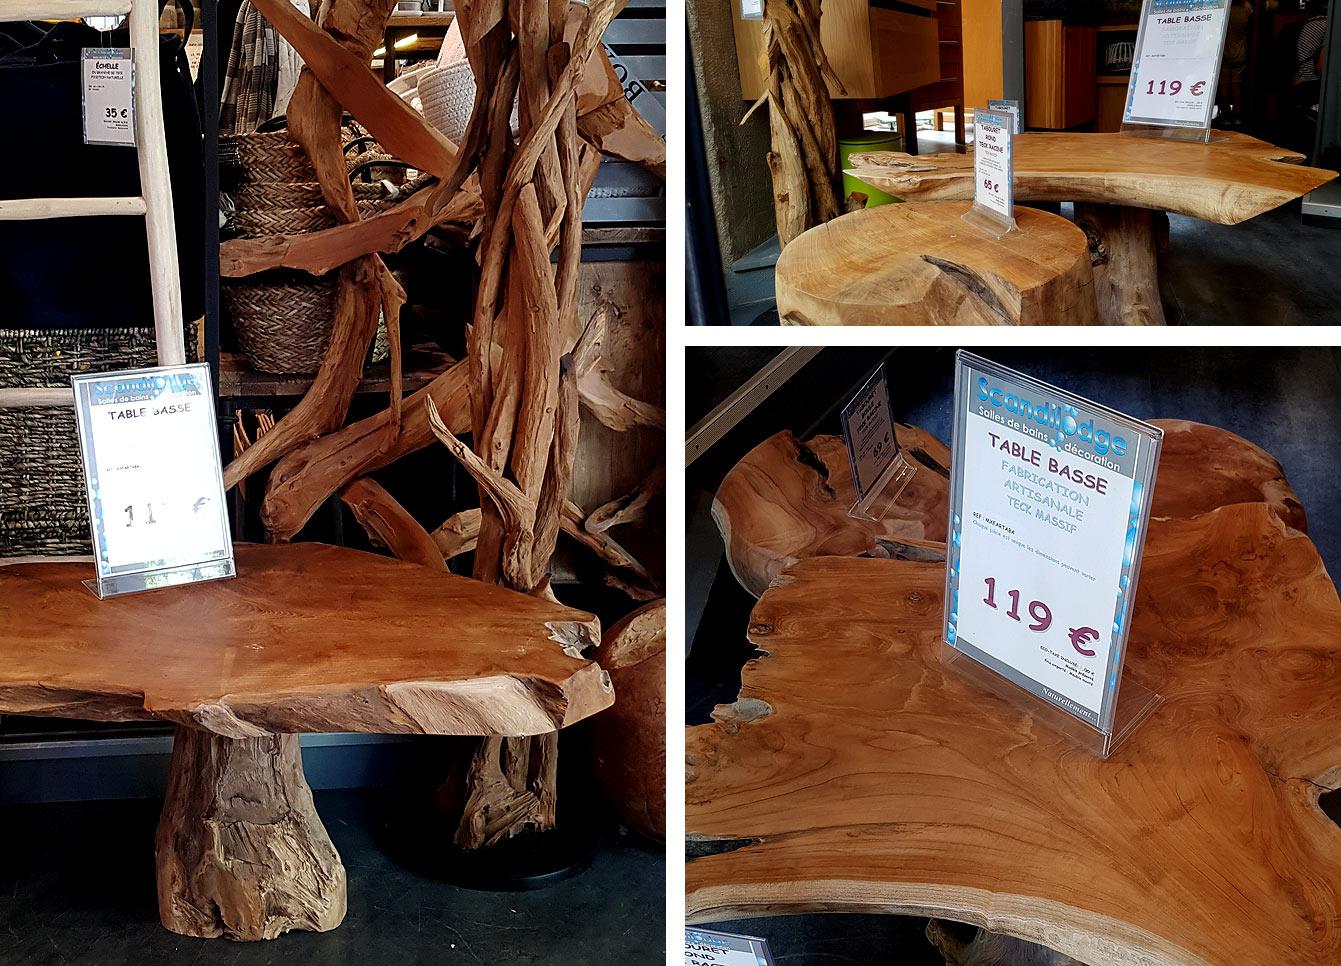 Tabouret rond teck racine, table basse en bois, teck massif